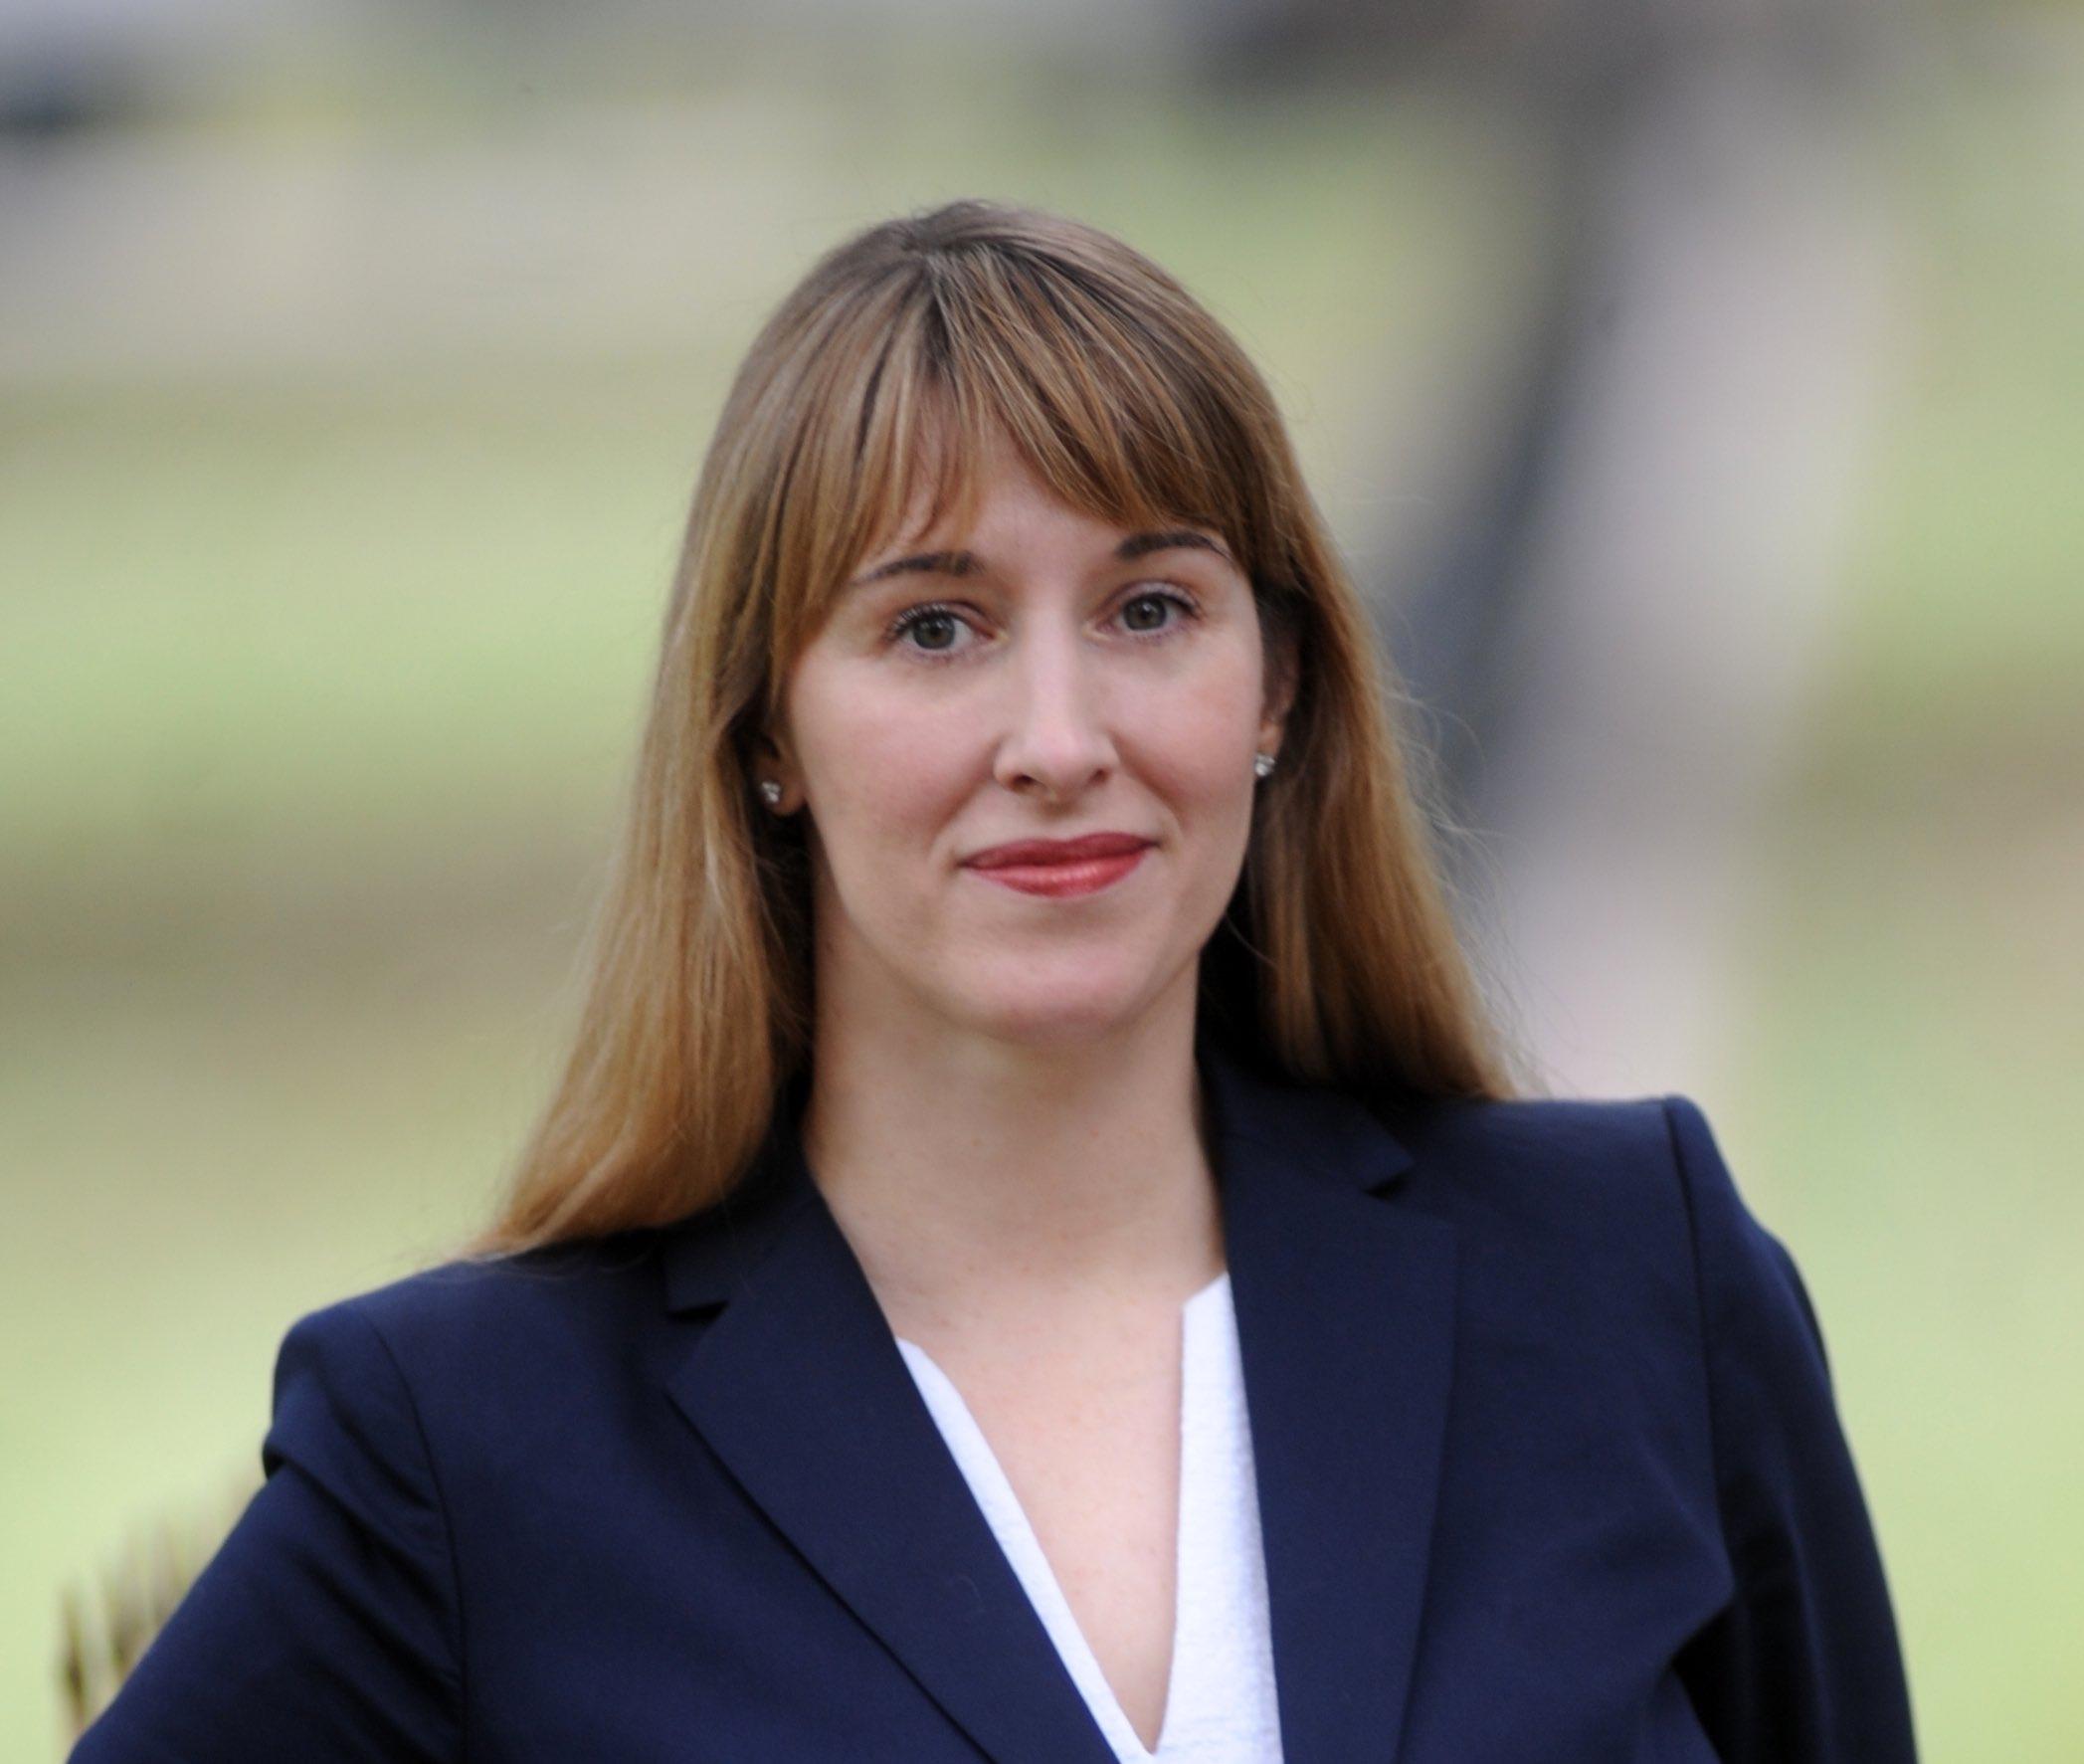 Jennifer Freel